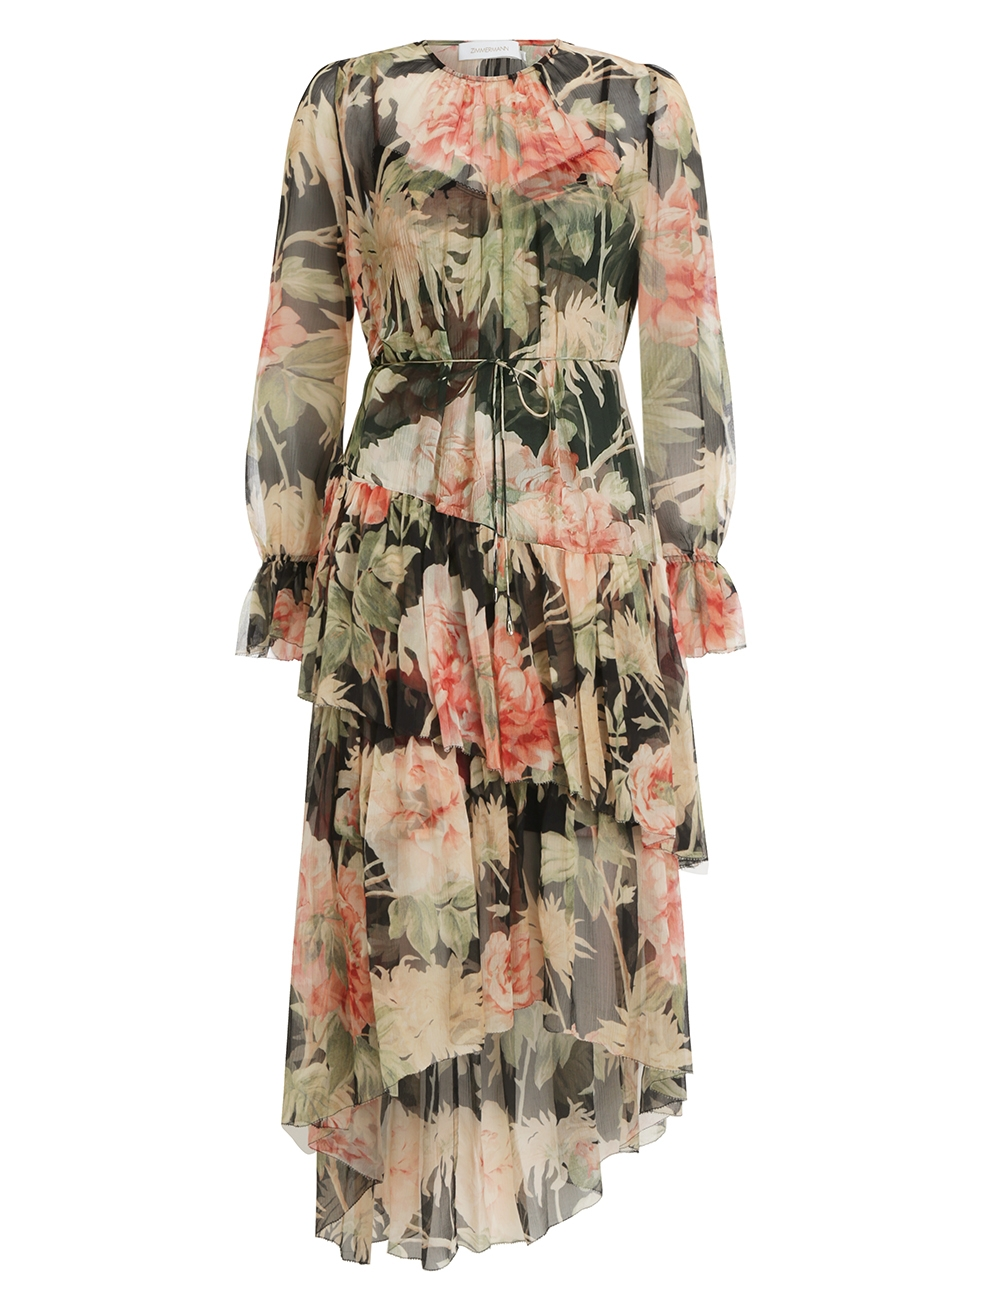 Espionage Asymmetric Dress